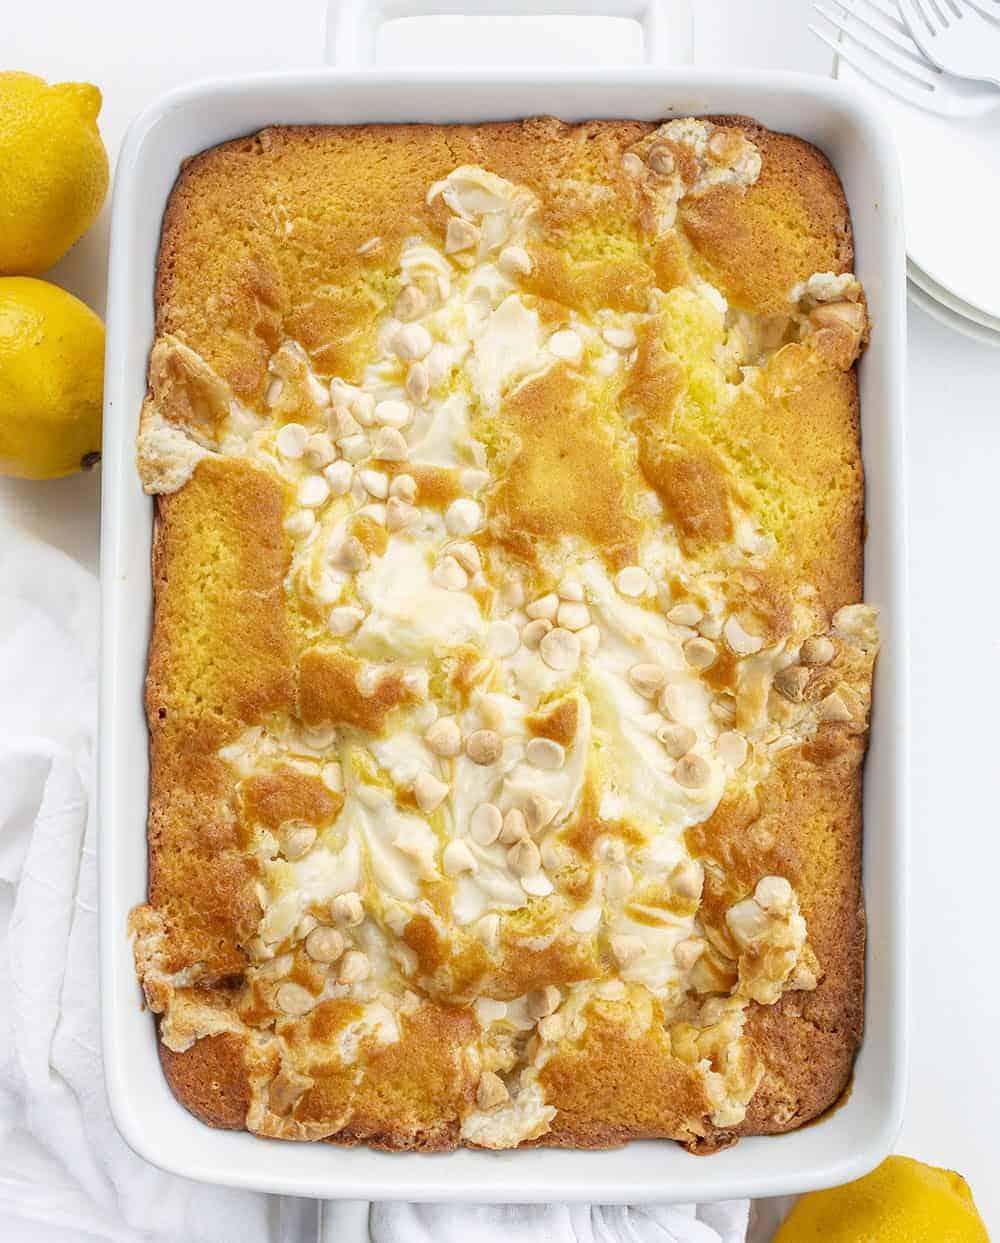 Overhead of Lemon Earthquake Cake in White Pan with Lemons